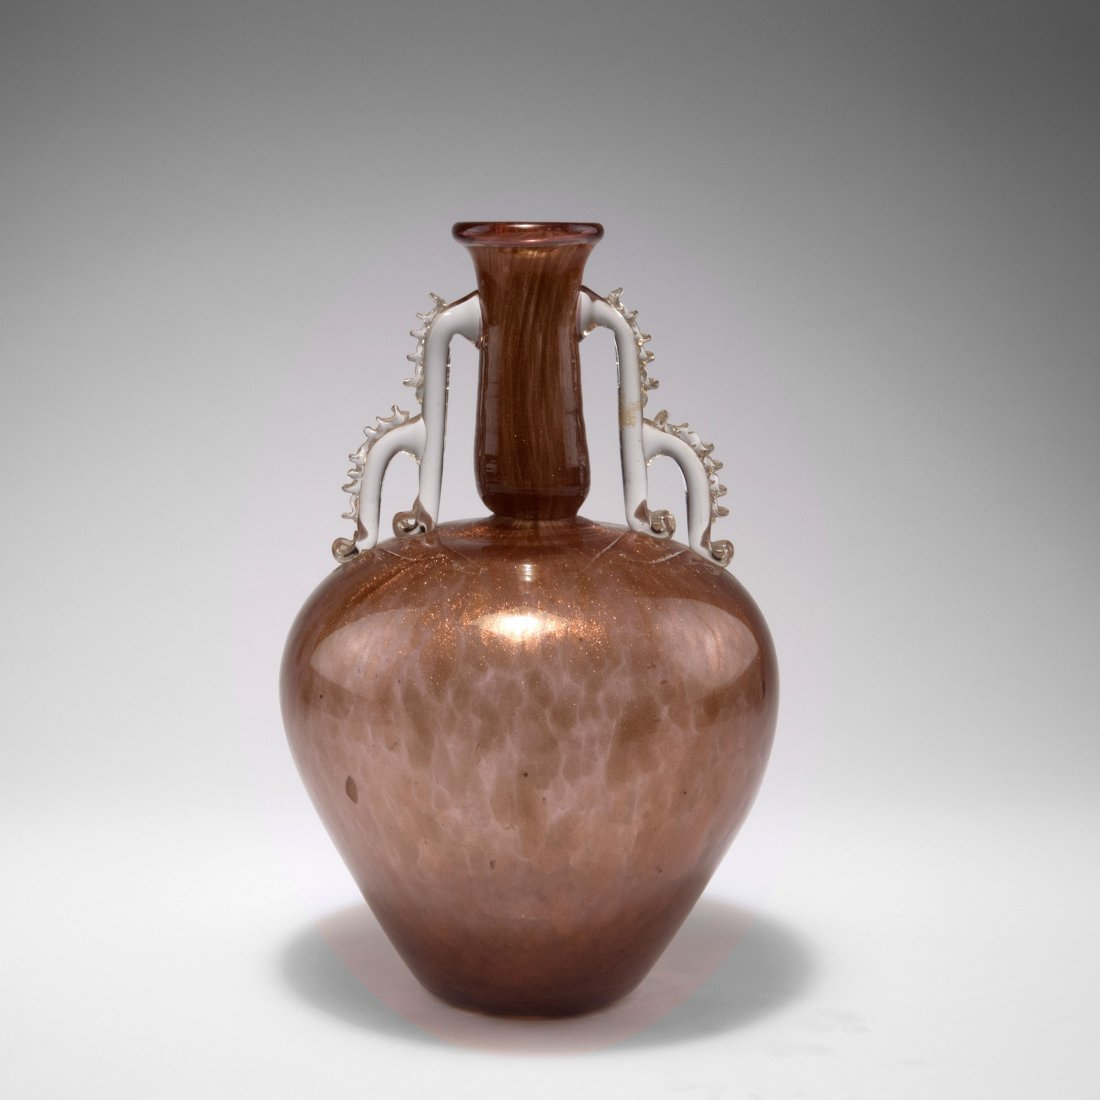 'Avventurina' vase with handles, 1929/30 - 2